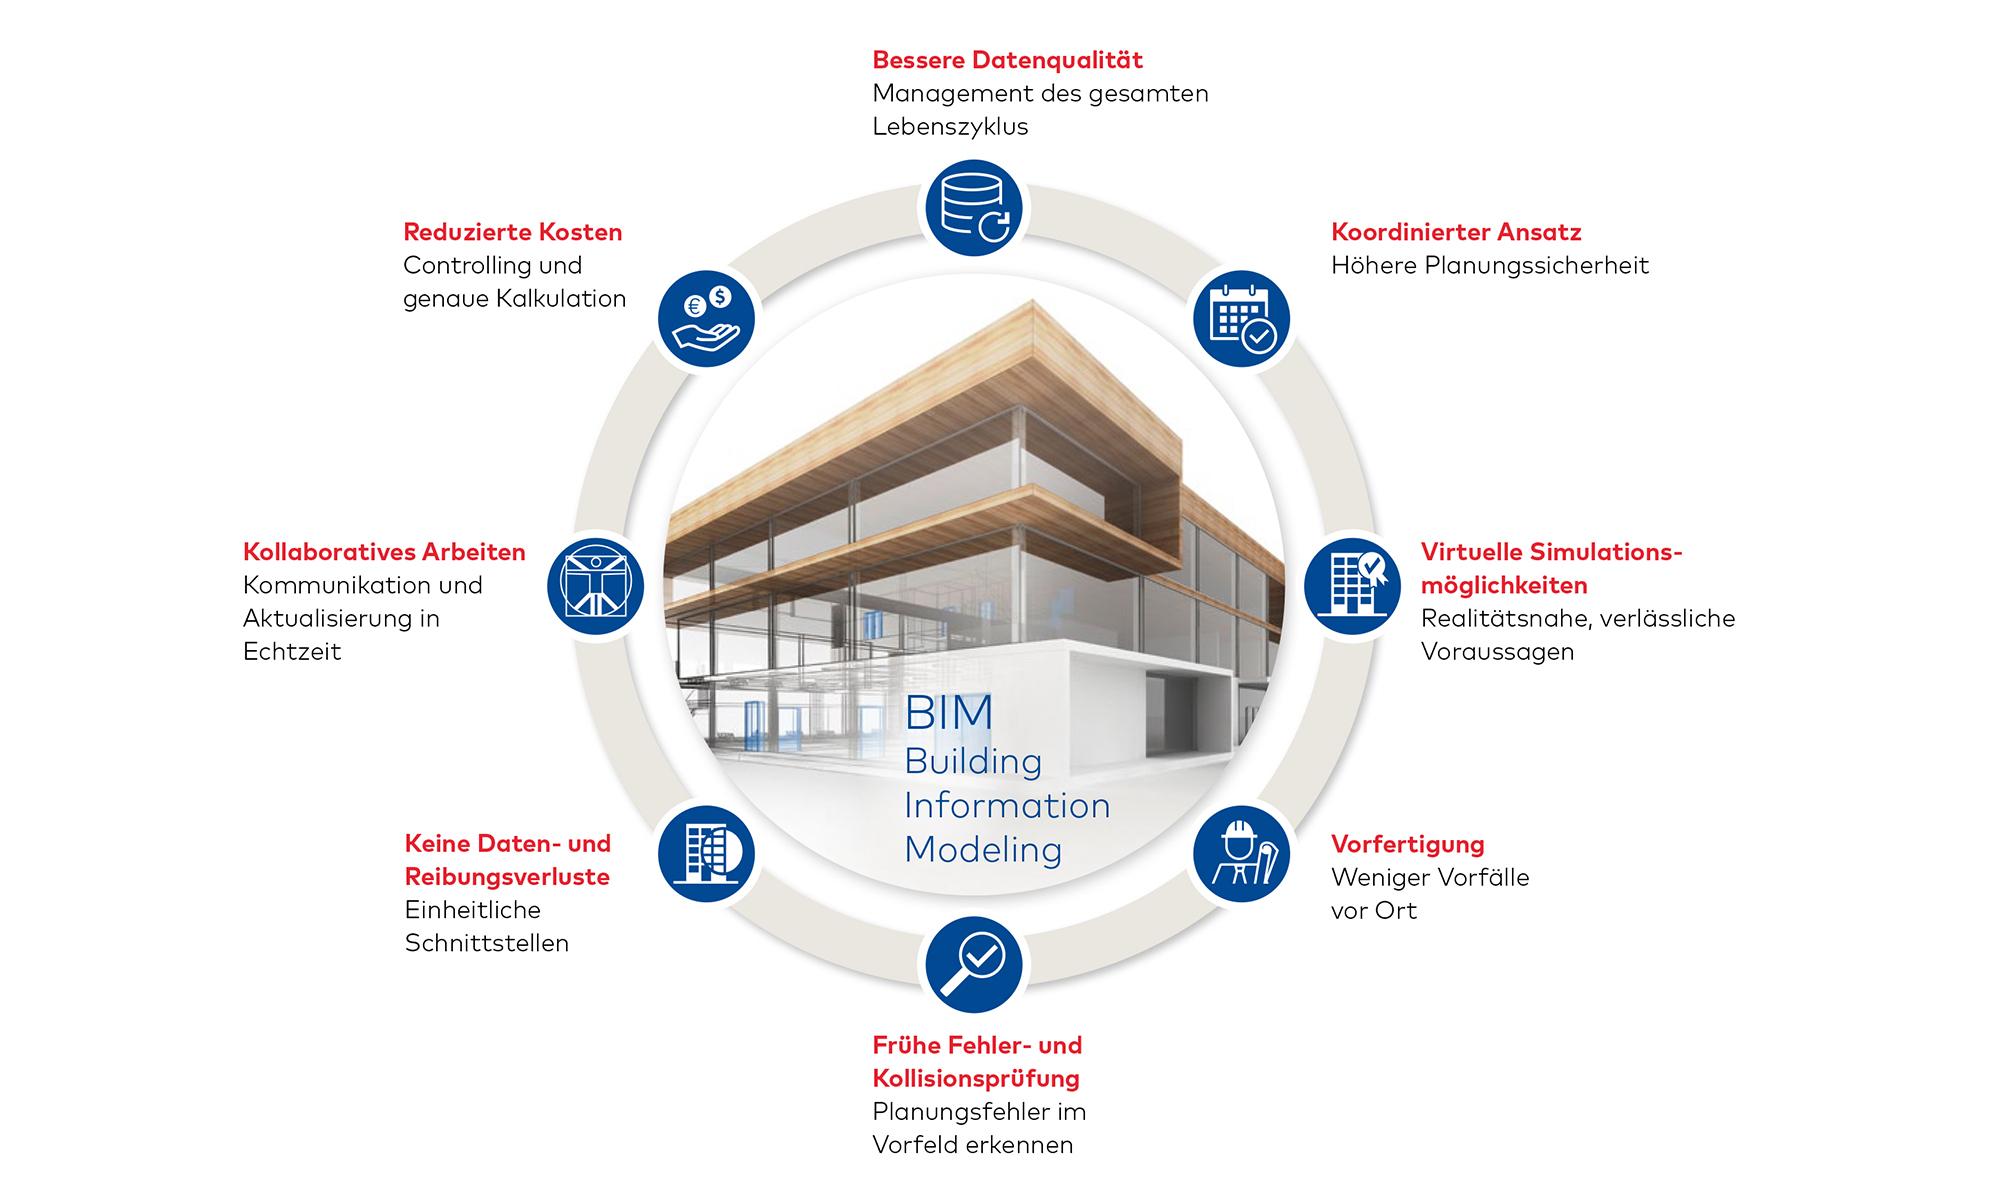 Building Information Modelling (BIM) Kreislauf